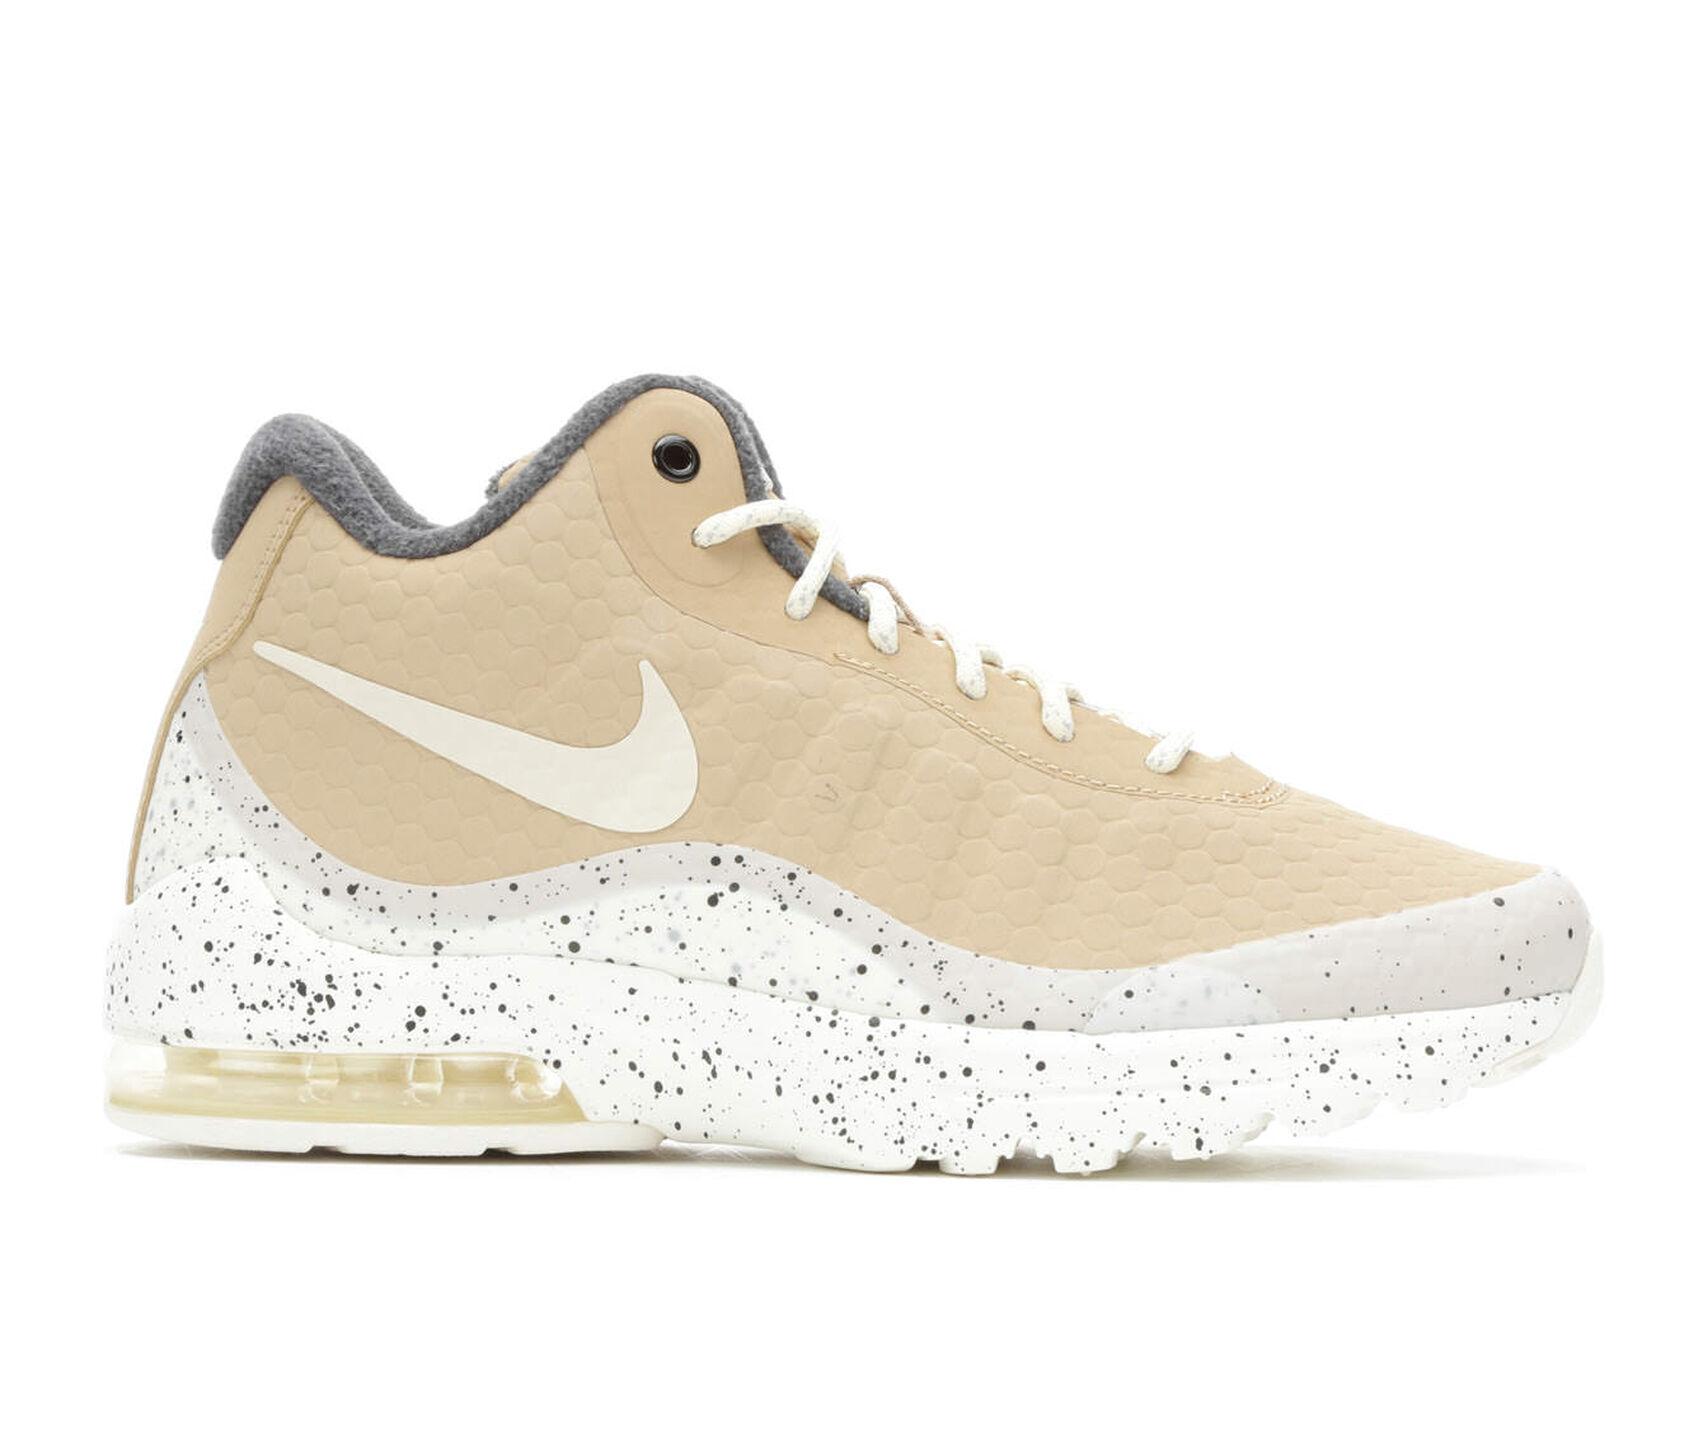 8230939312b6 Women s Nike Air Max Invigor Mid Athletic Sneakers